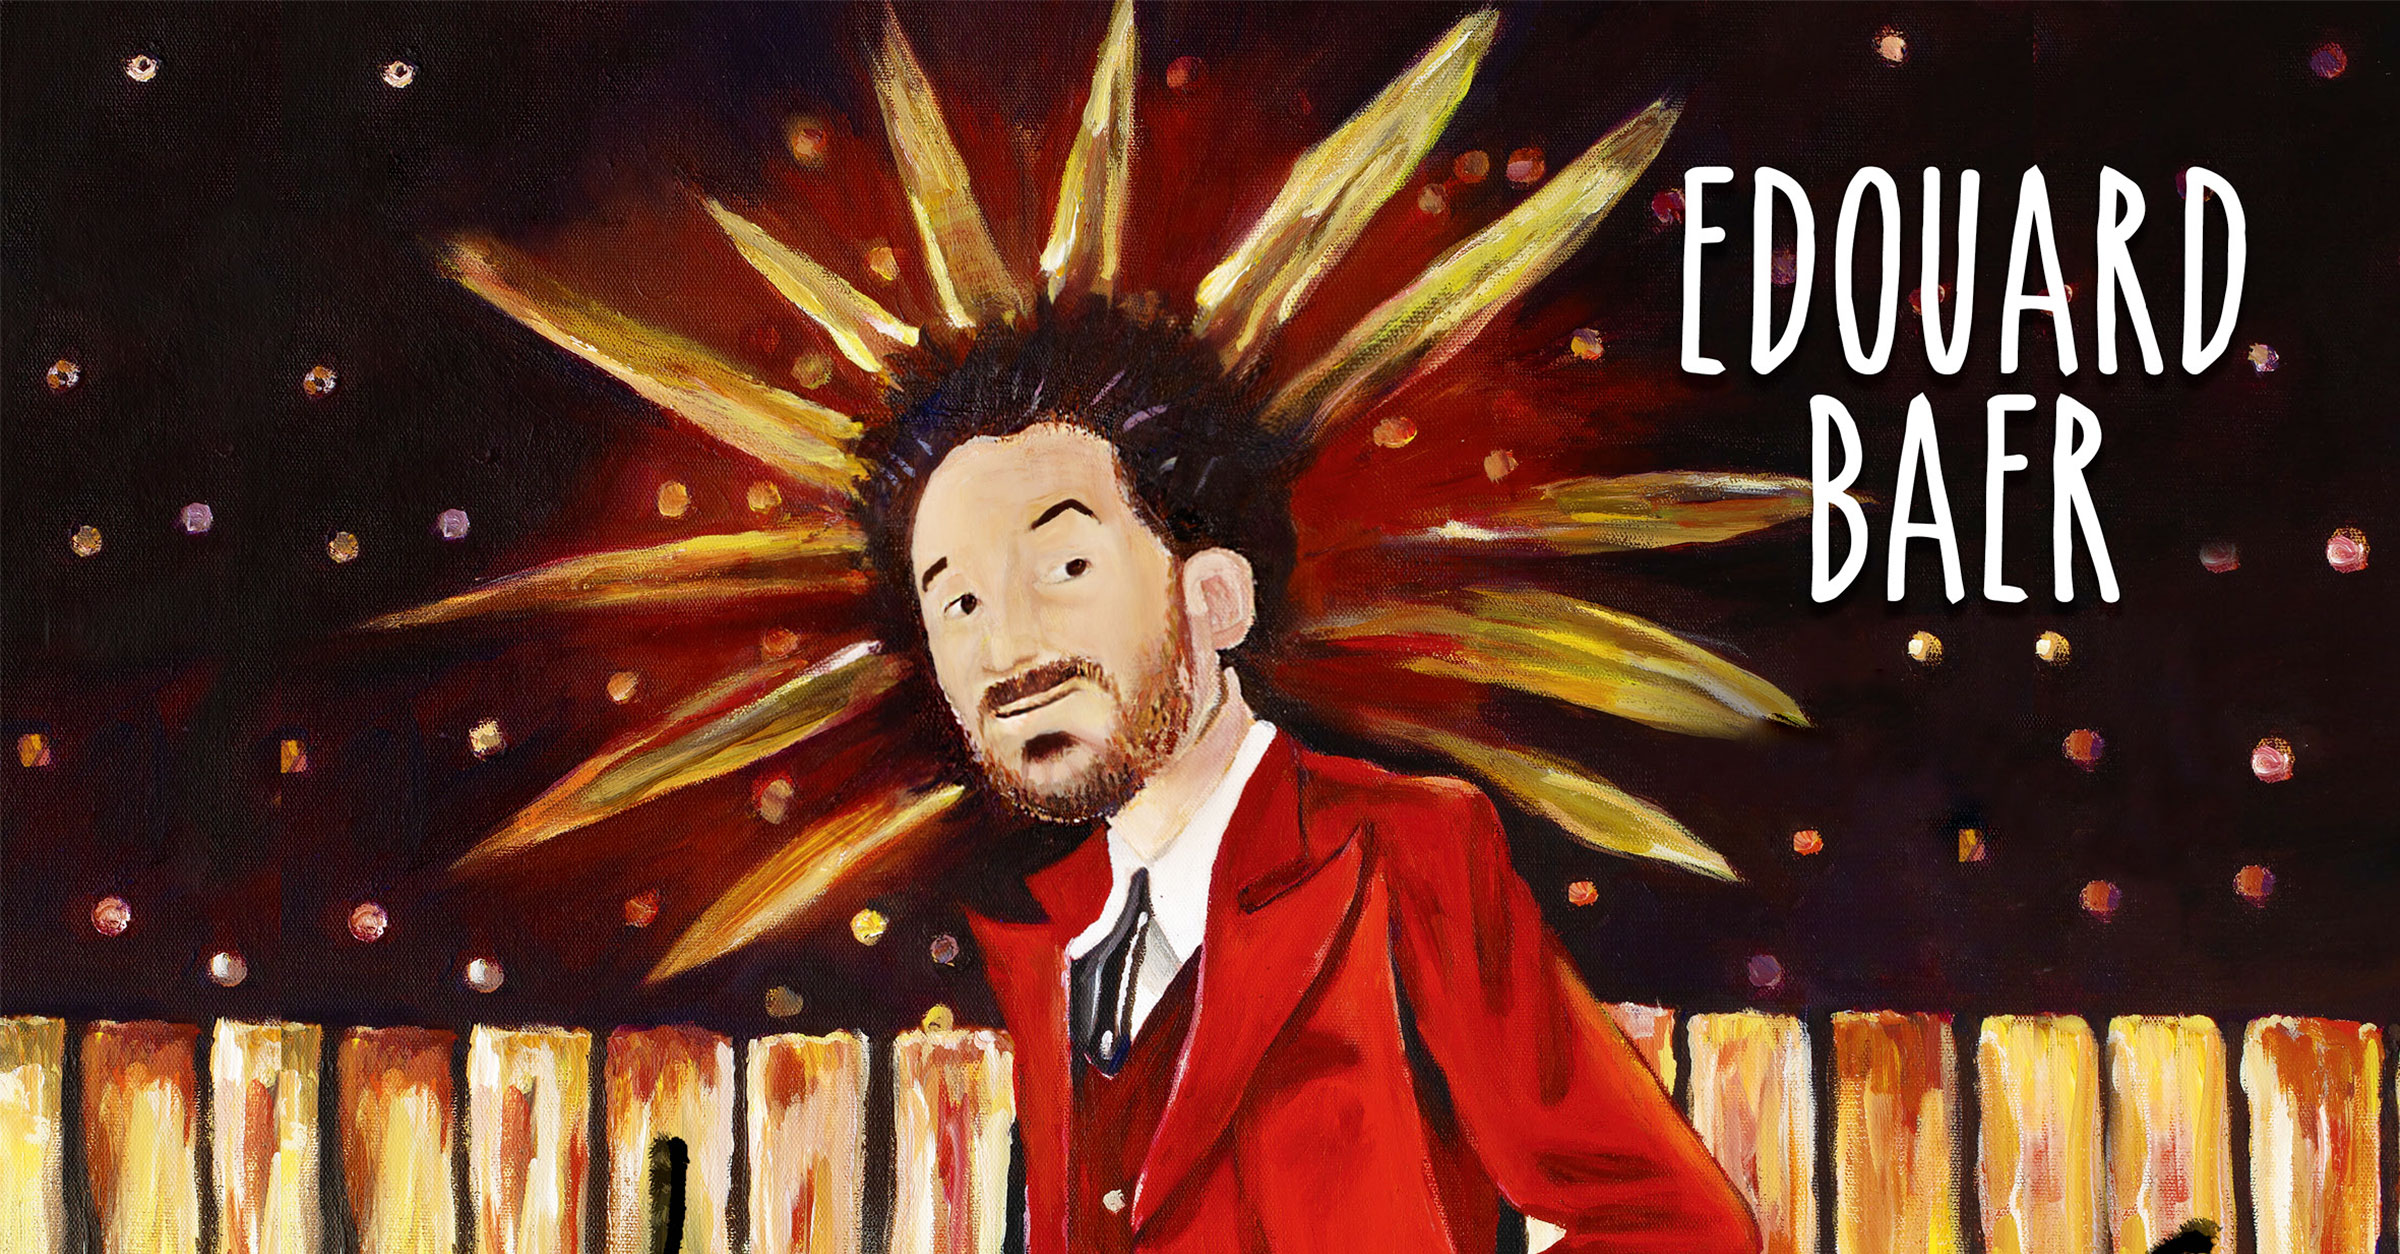 Edouard baer nouveau spectacle cover